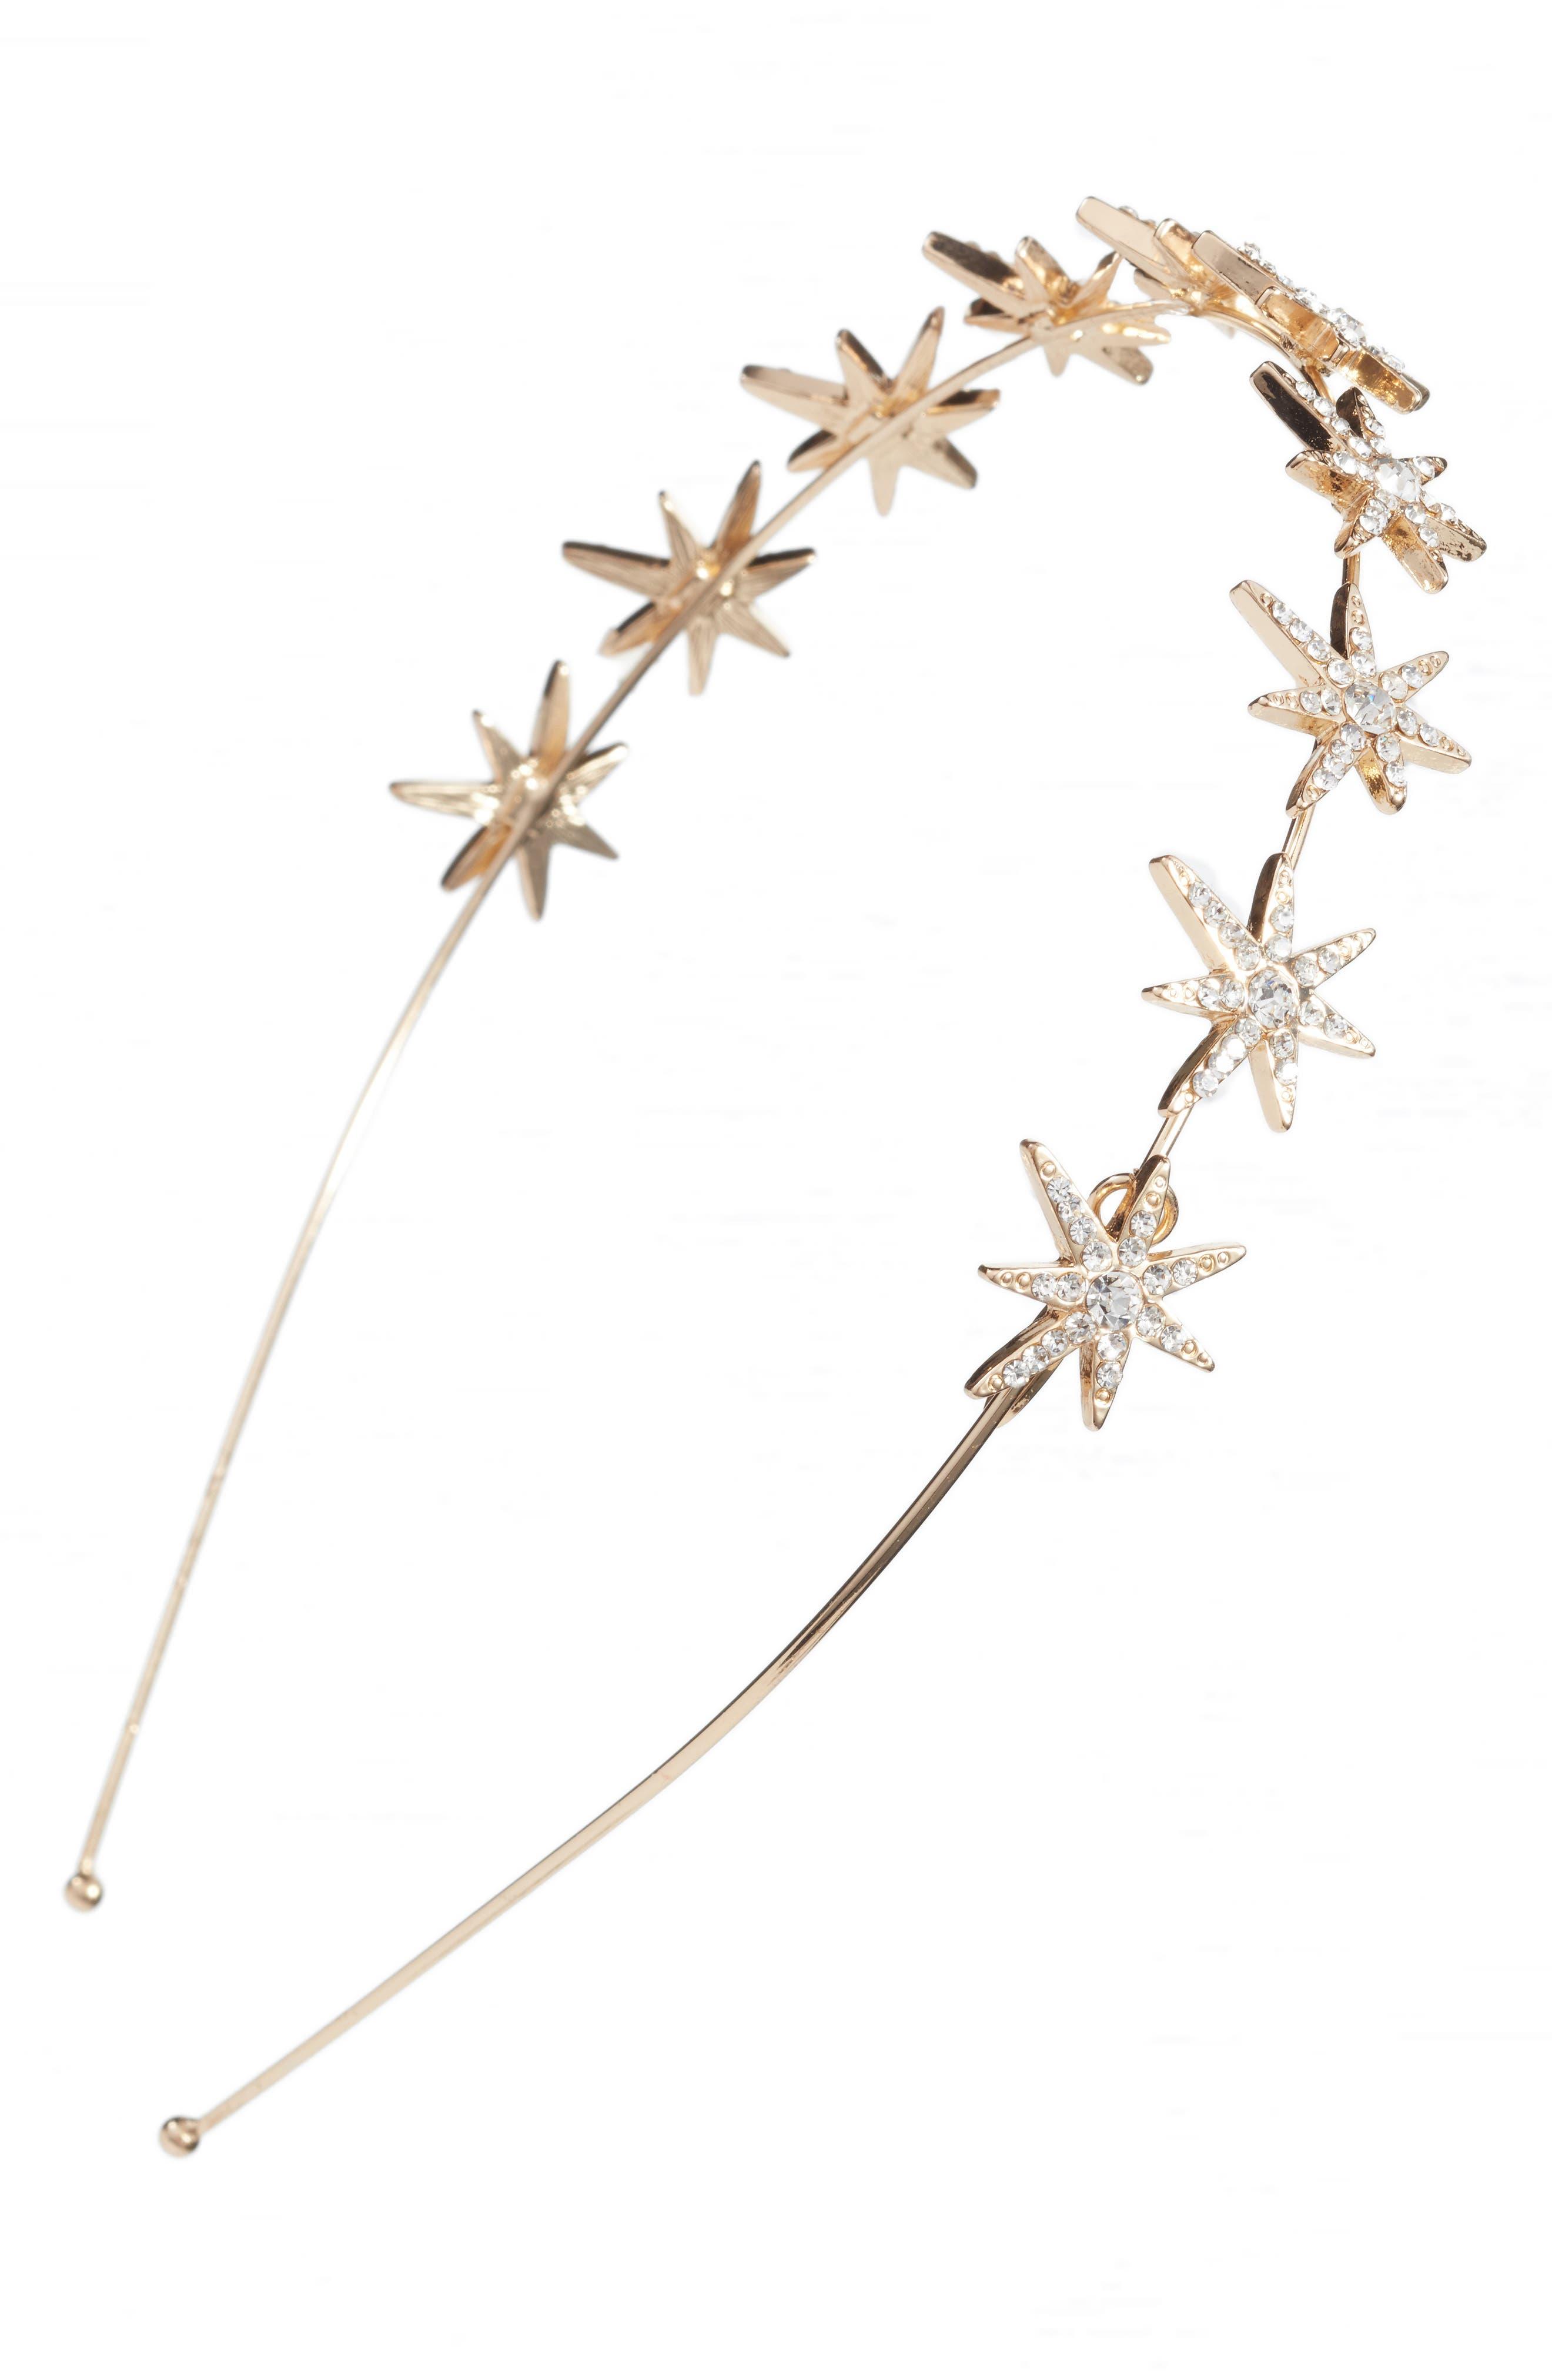 Main Image - Tasha Star Crystal Headband